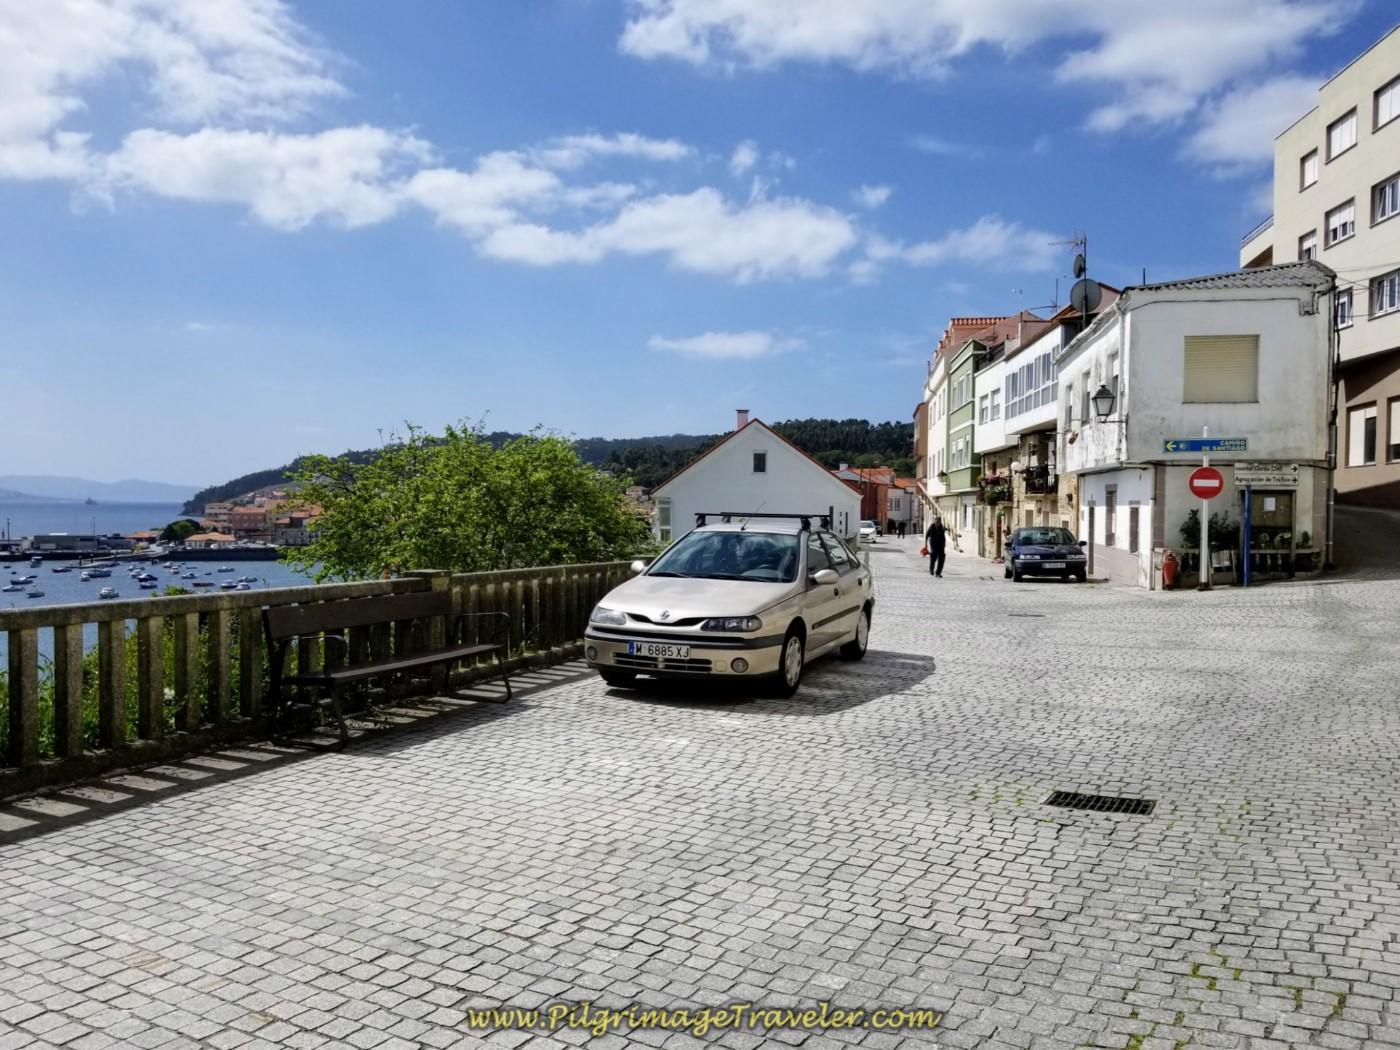 Along the Rúa Alameda in Corcubión